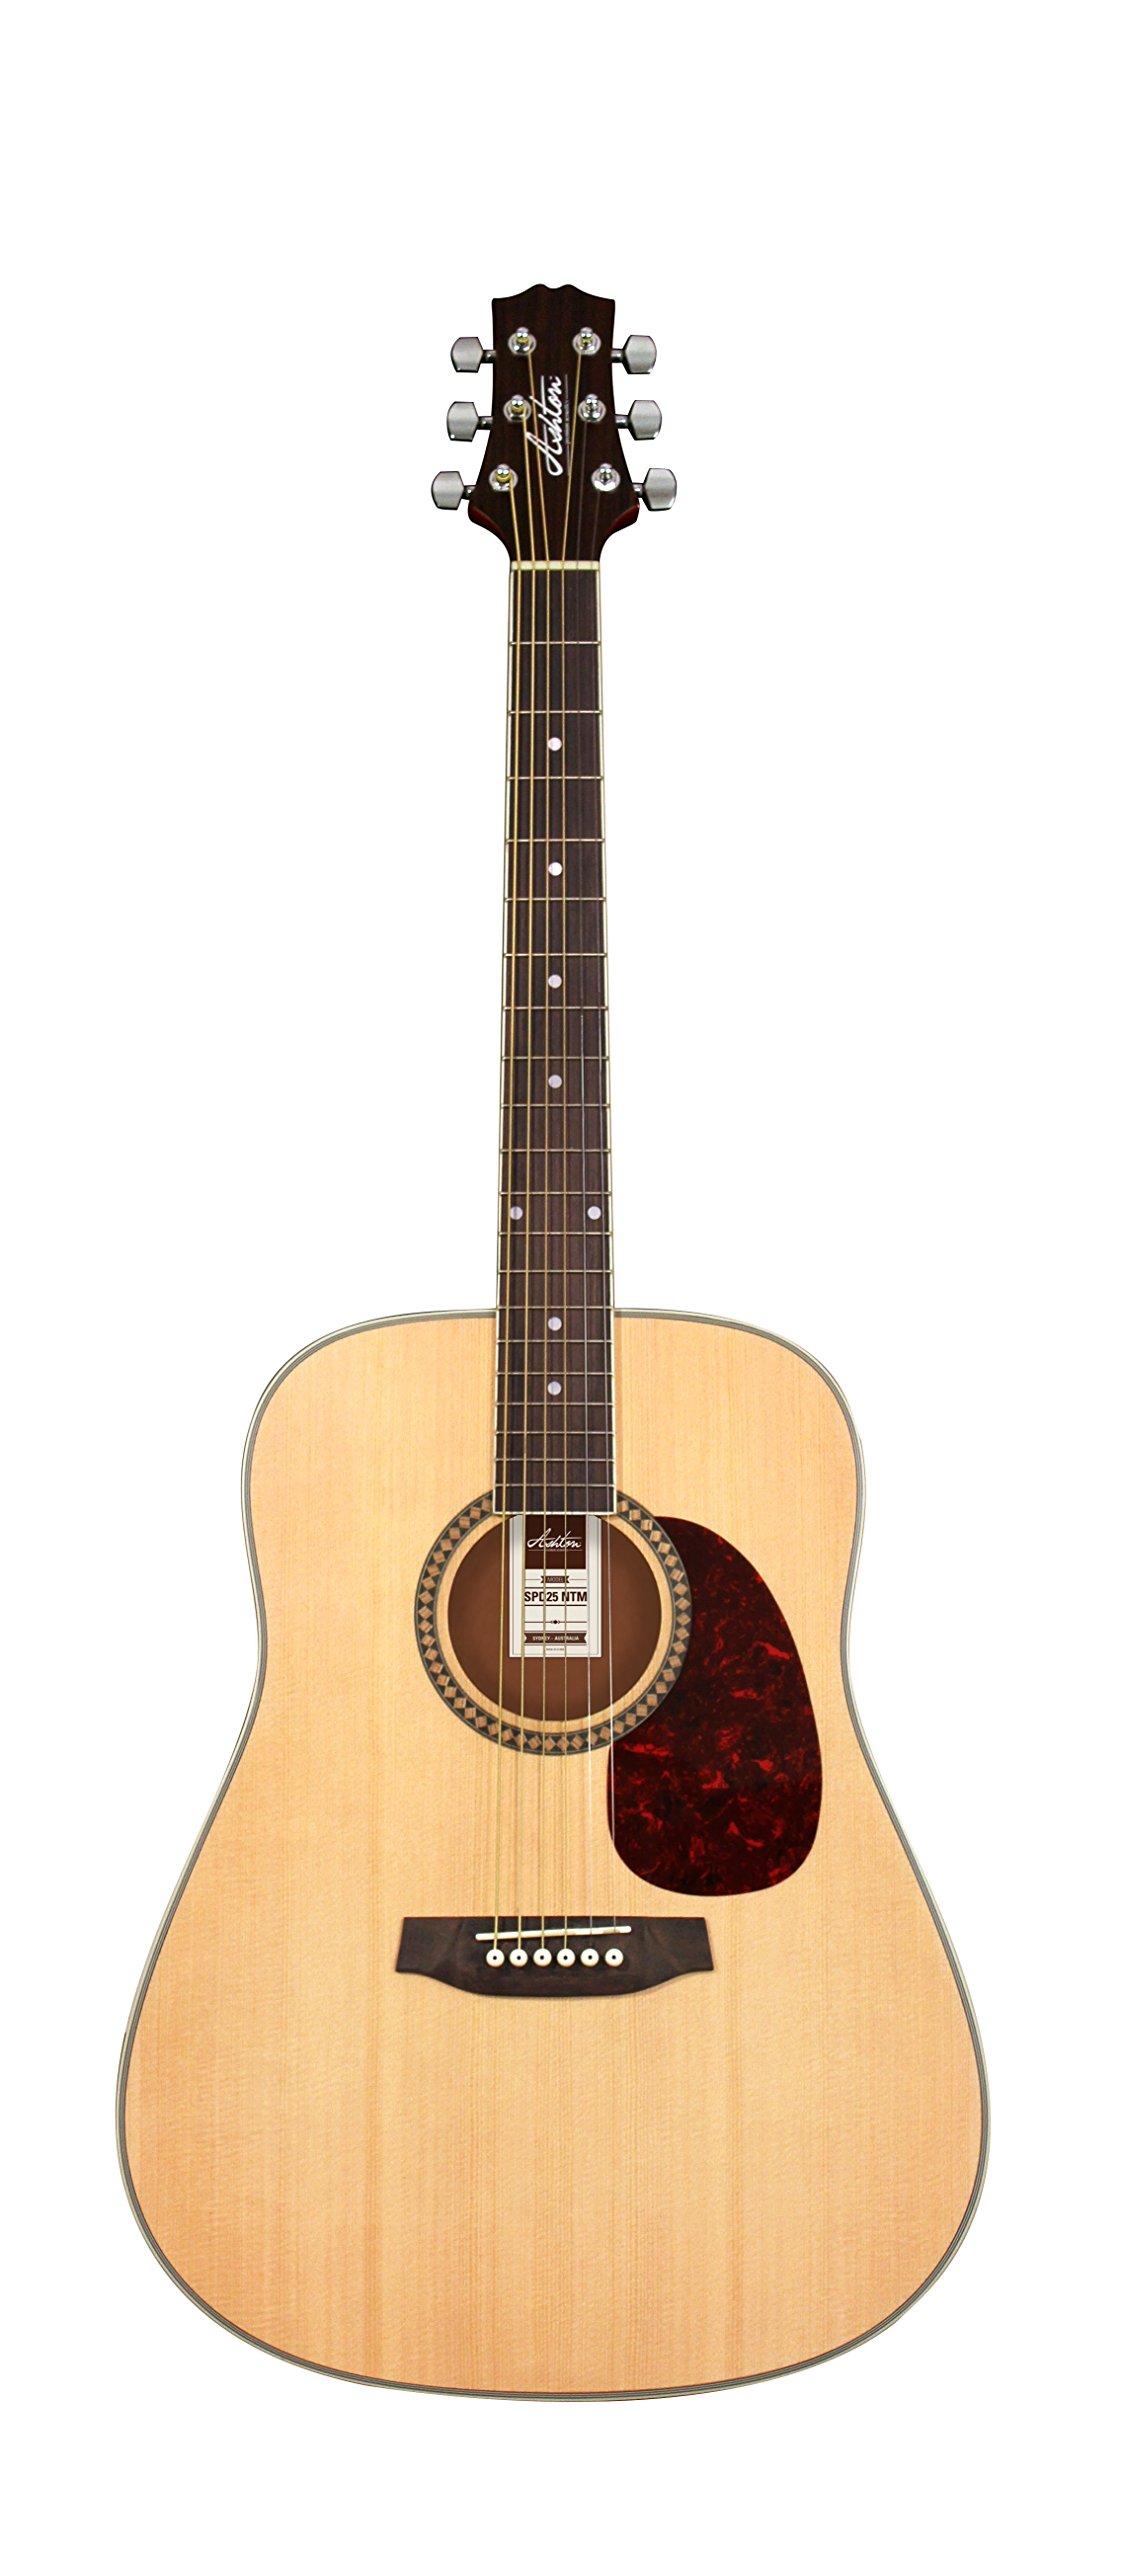 Ashton D Series SPD25NTM Dreadnought Acoustic Guitar Pack - Natural Matte Finish